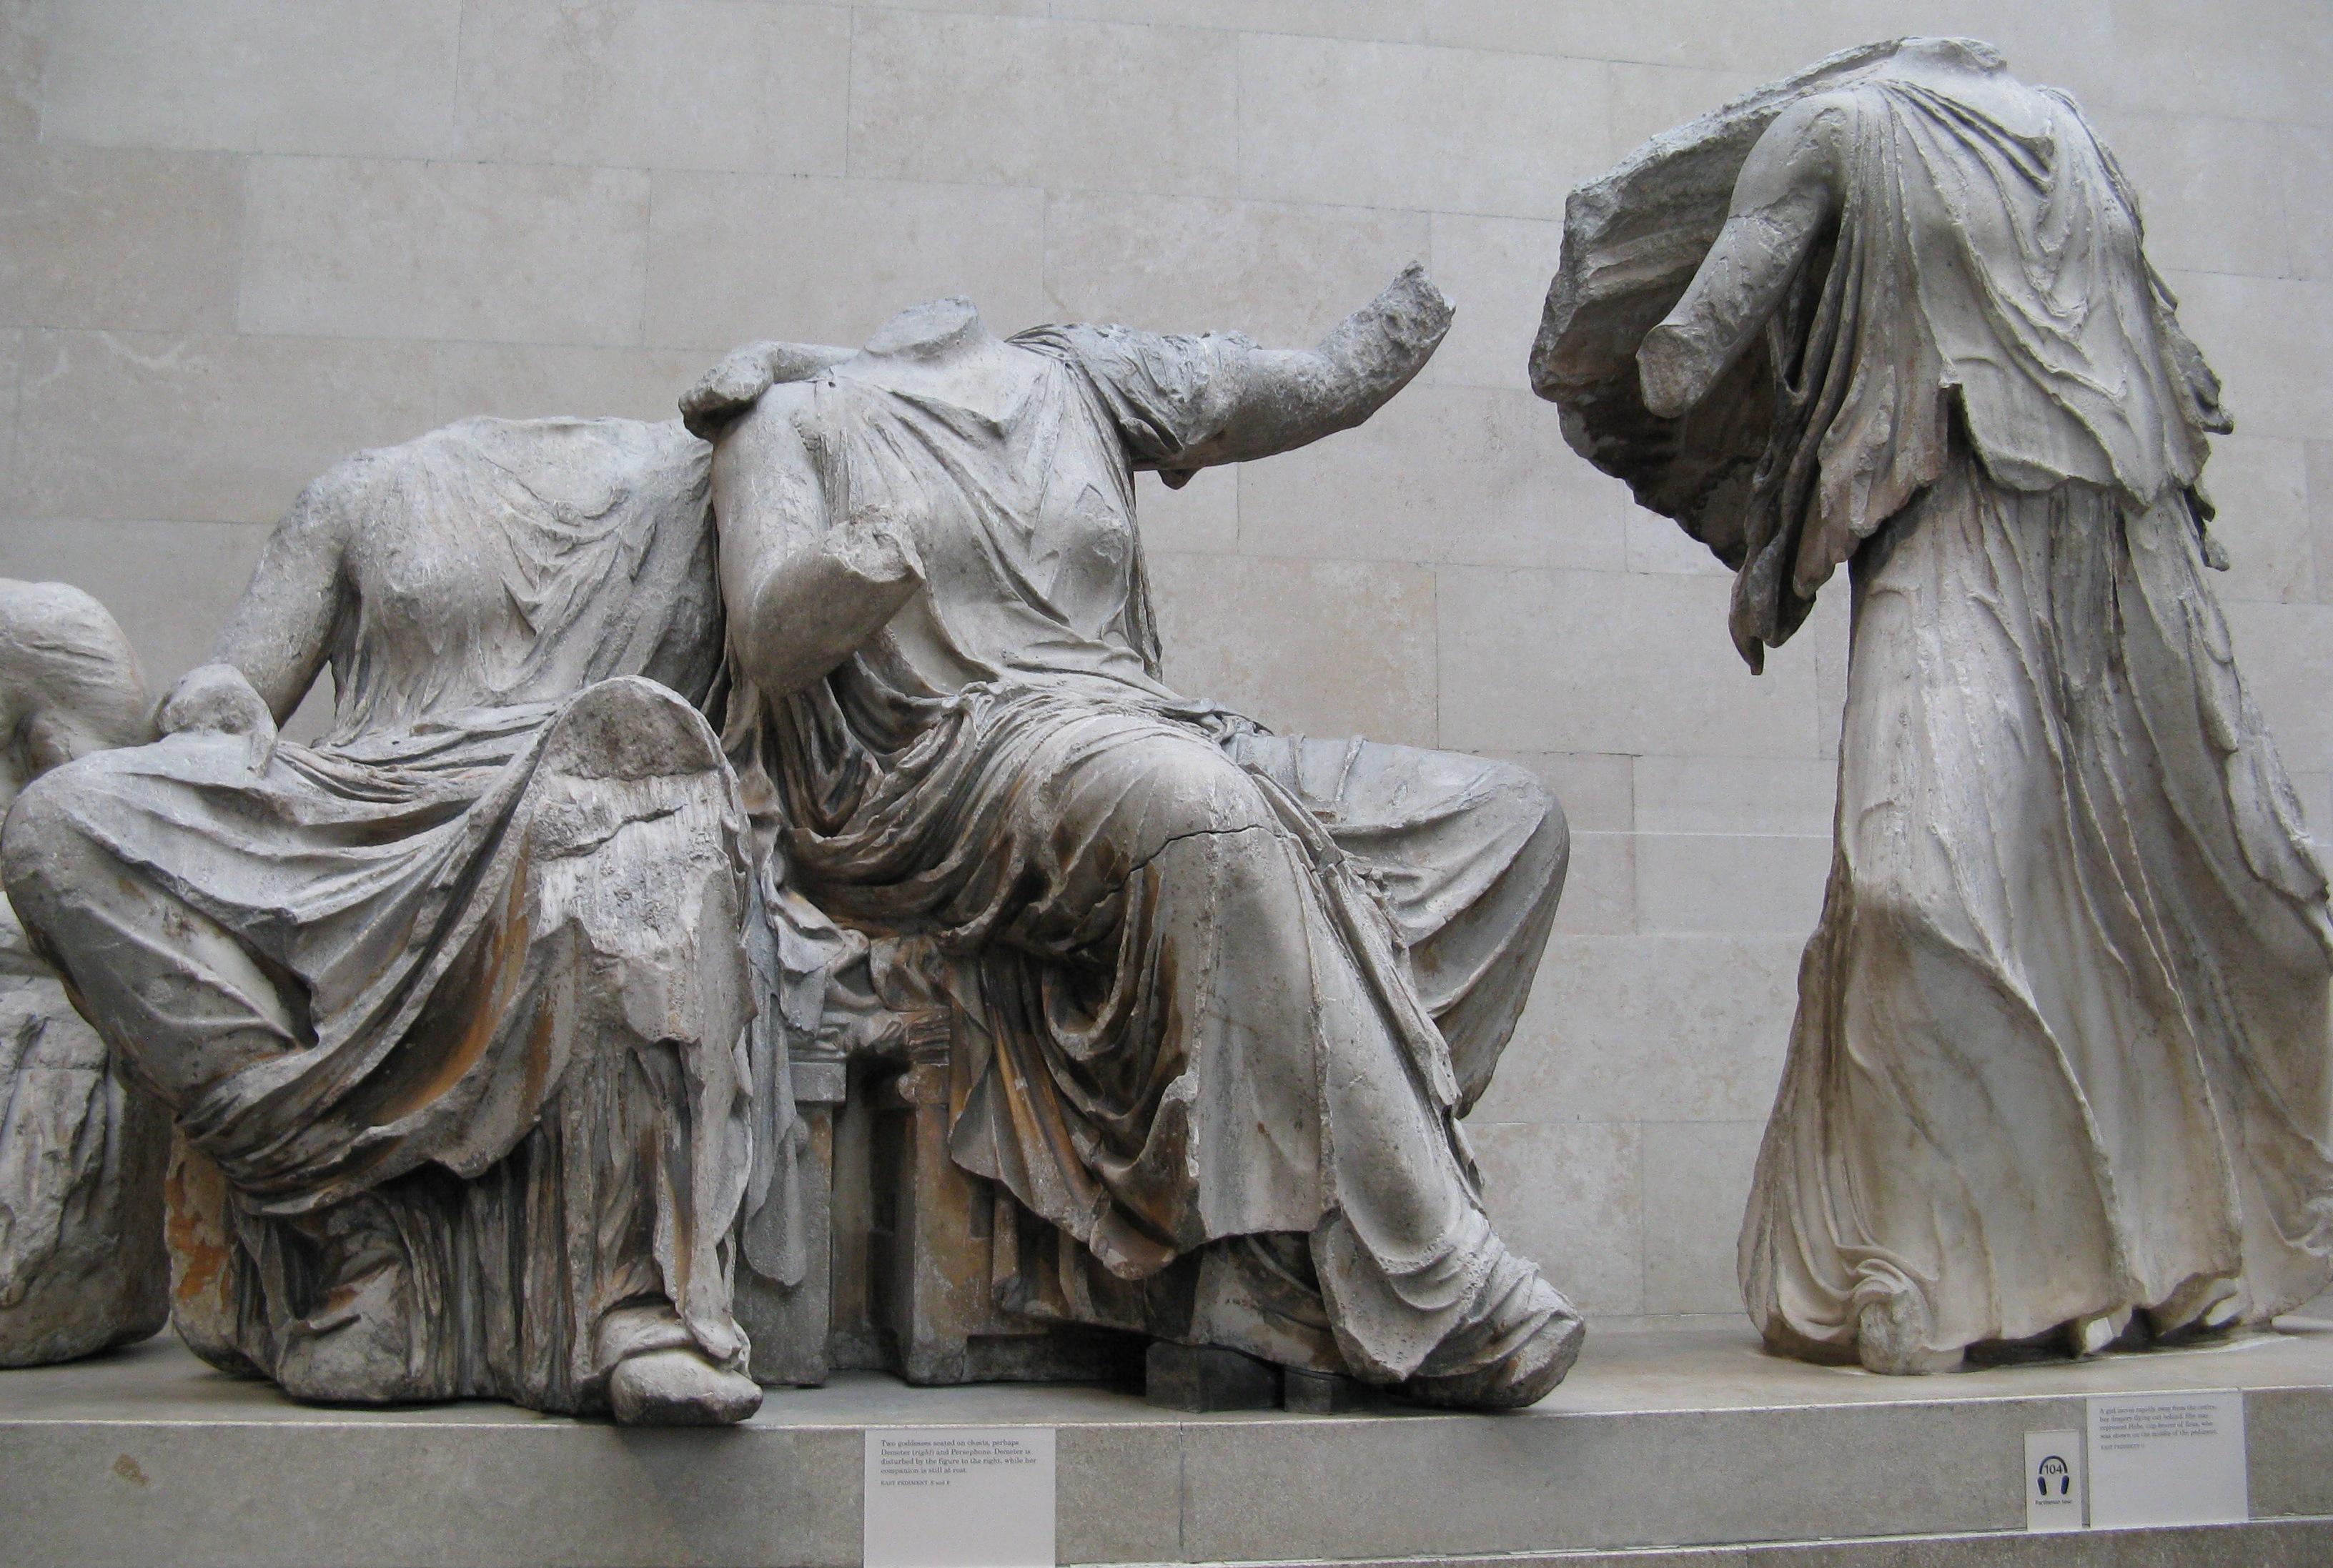 Pediments_of_the_Parthenon-British_Museum-4